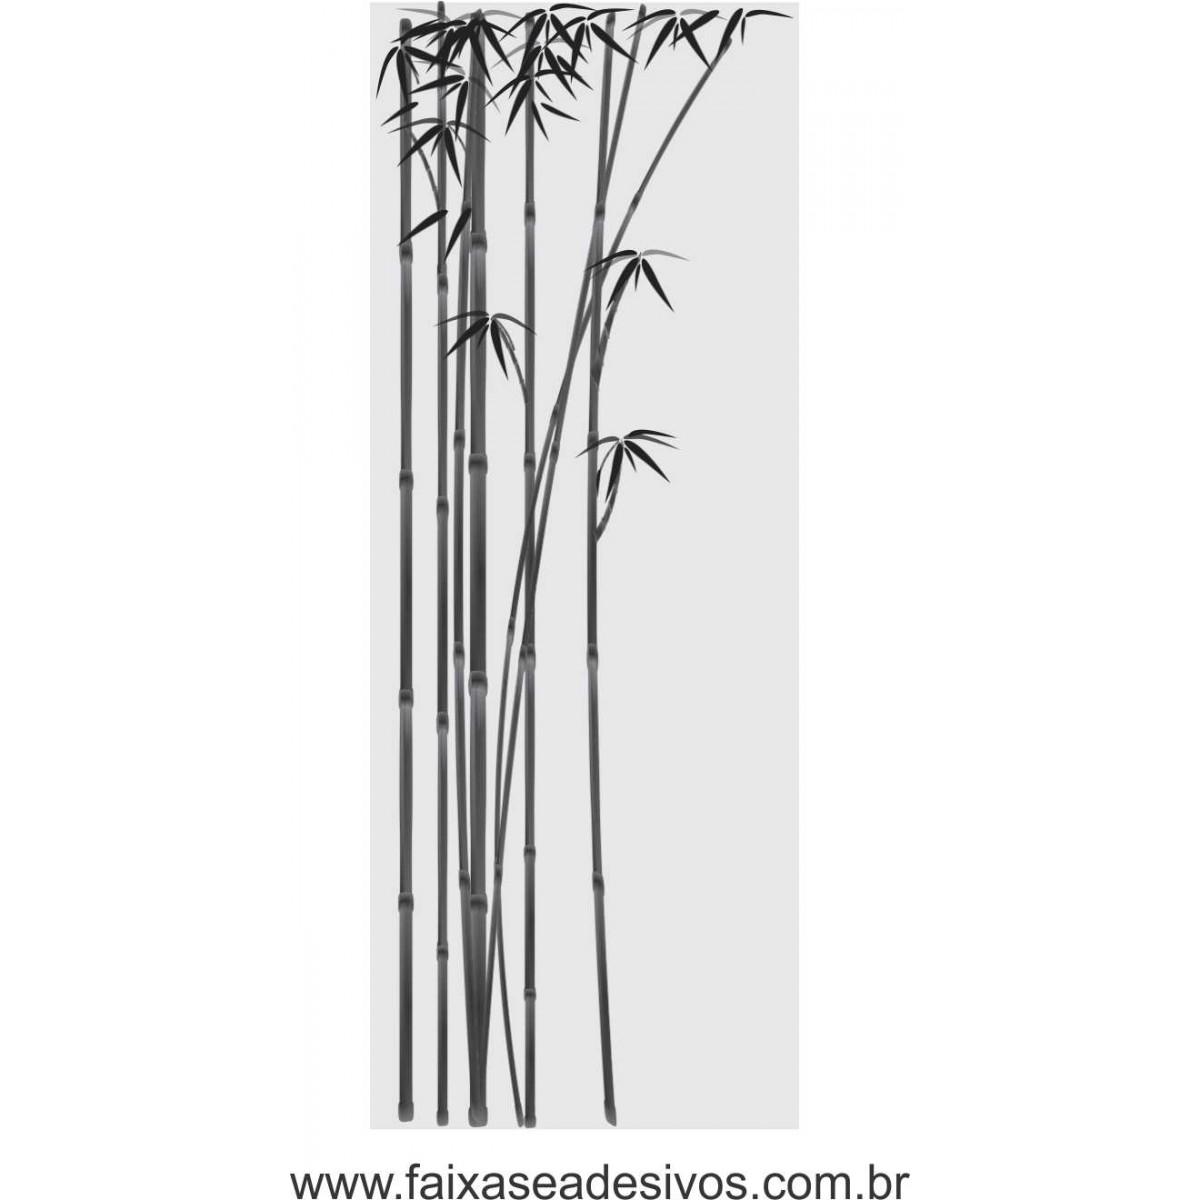 088 VD - Adesivo Jateado para vidro Bamboo 220x70cm  - Fac Signs